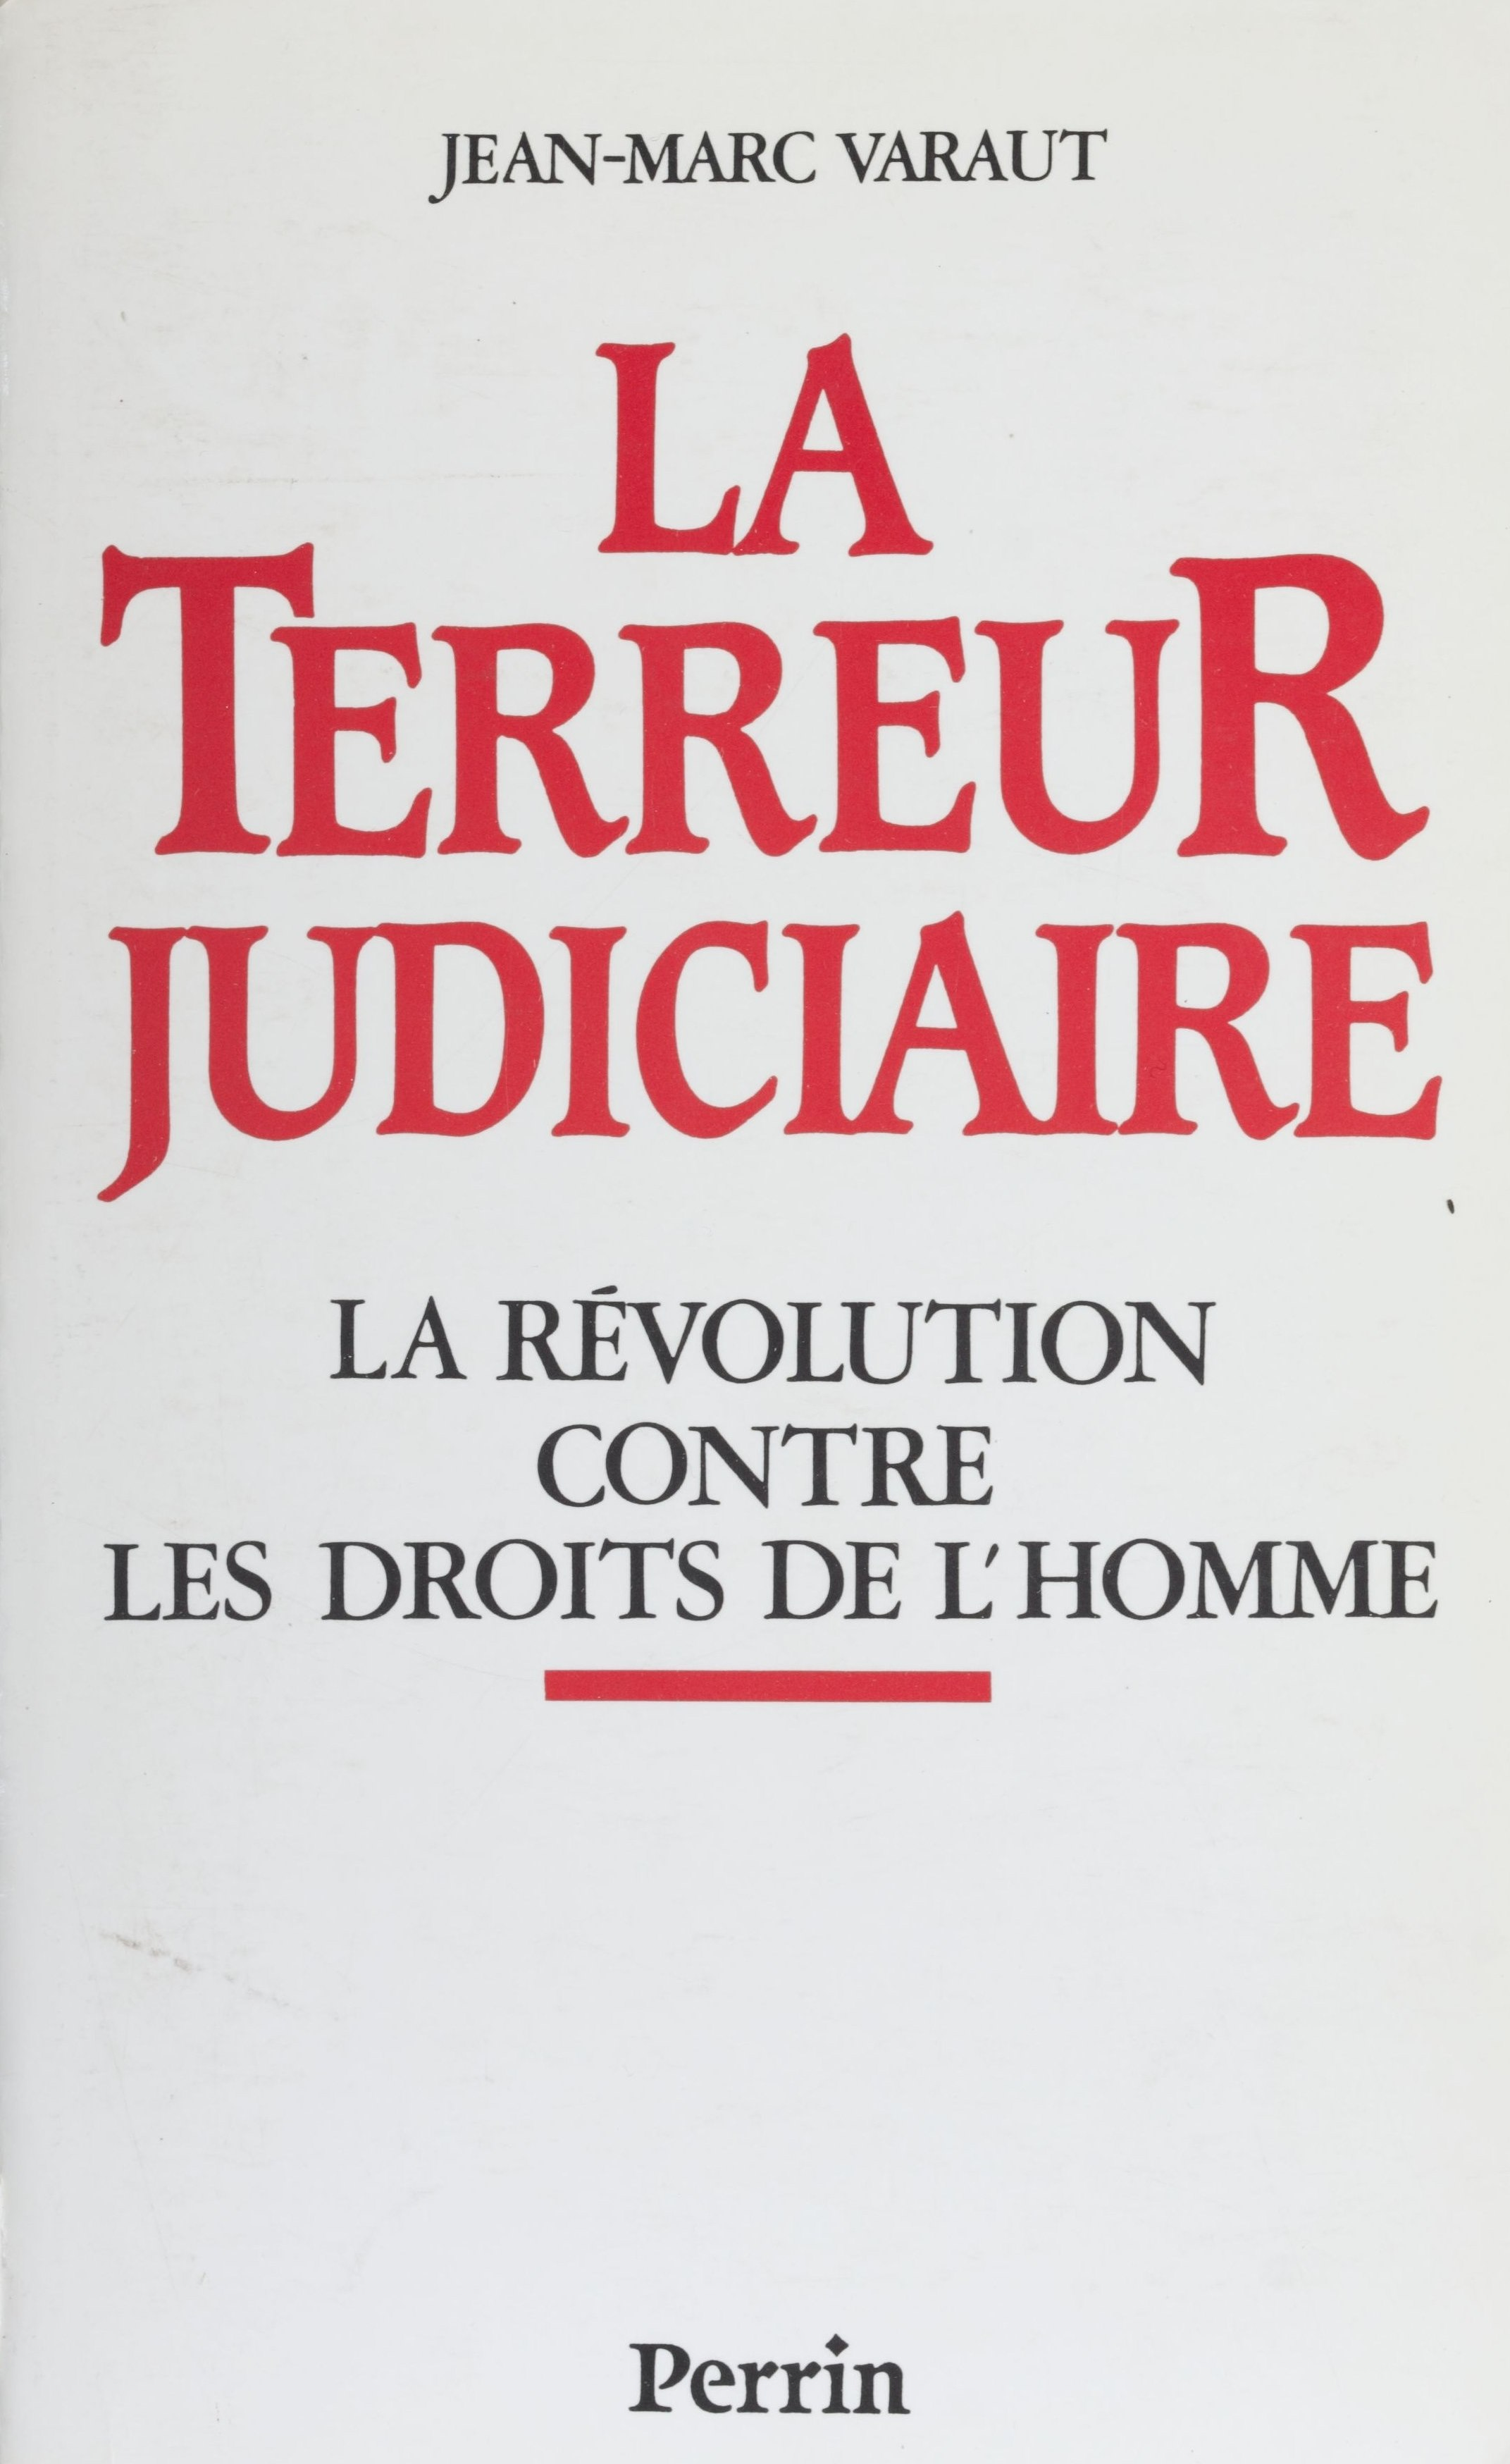 La Terreur judiciaire